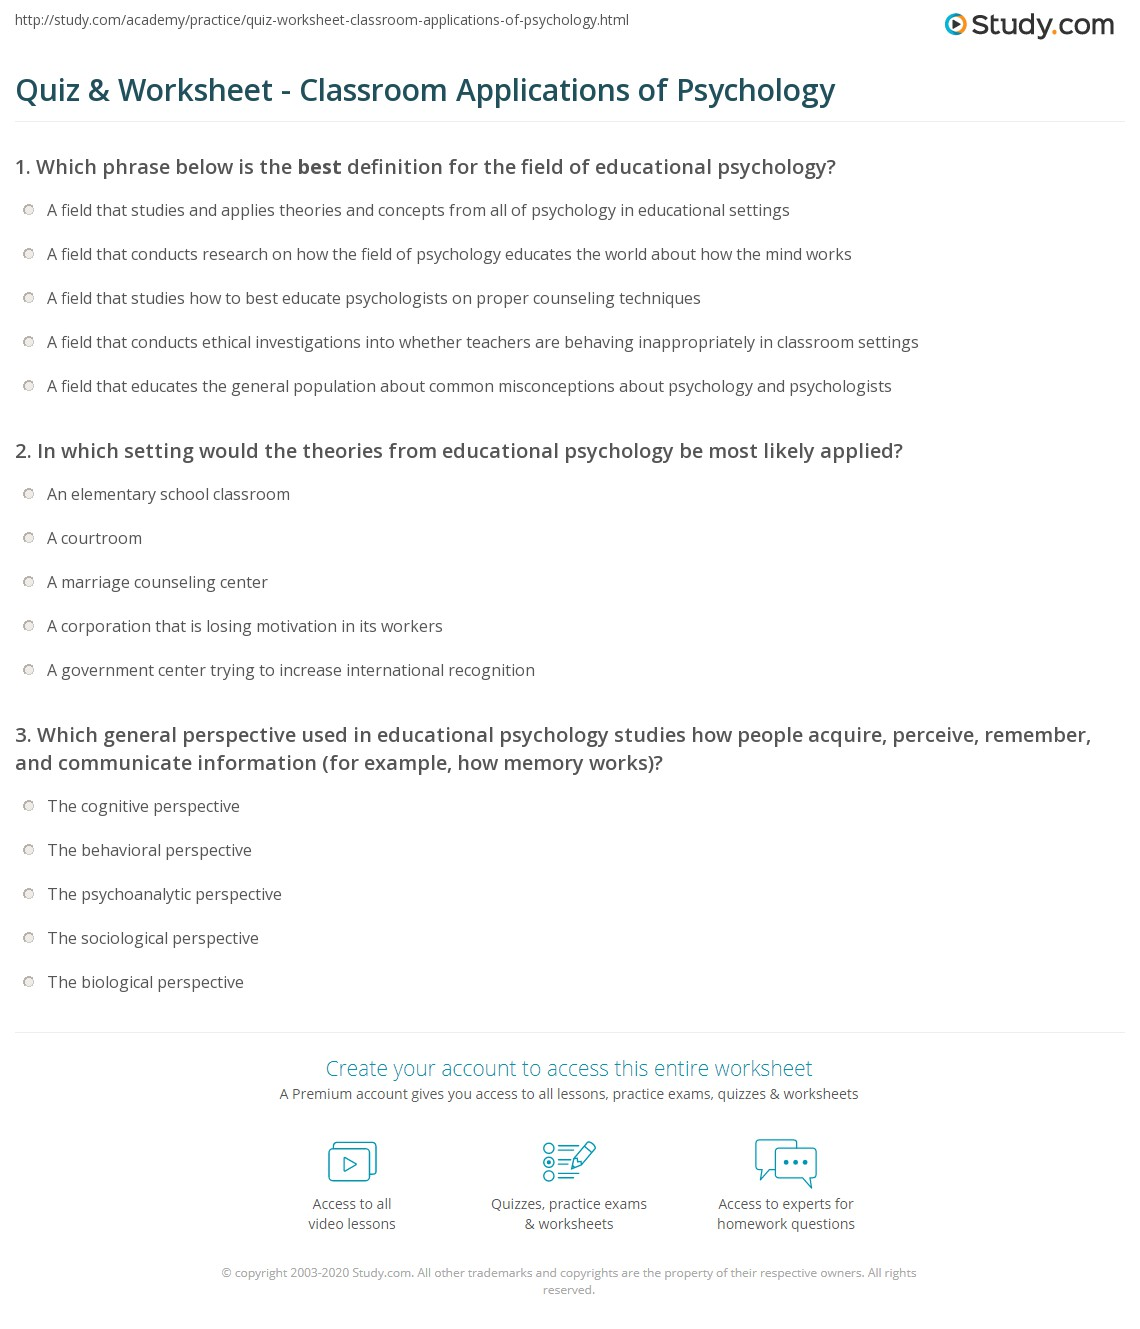 quiz & worksheet - classroom applications of psychology | study